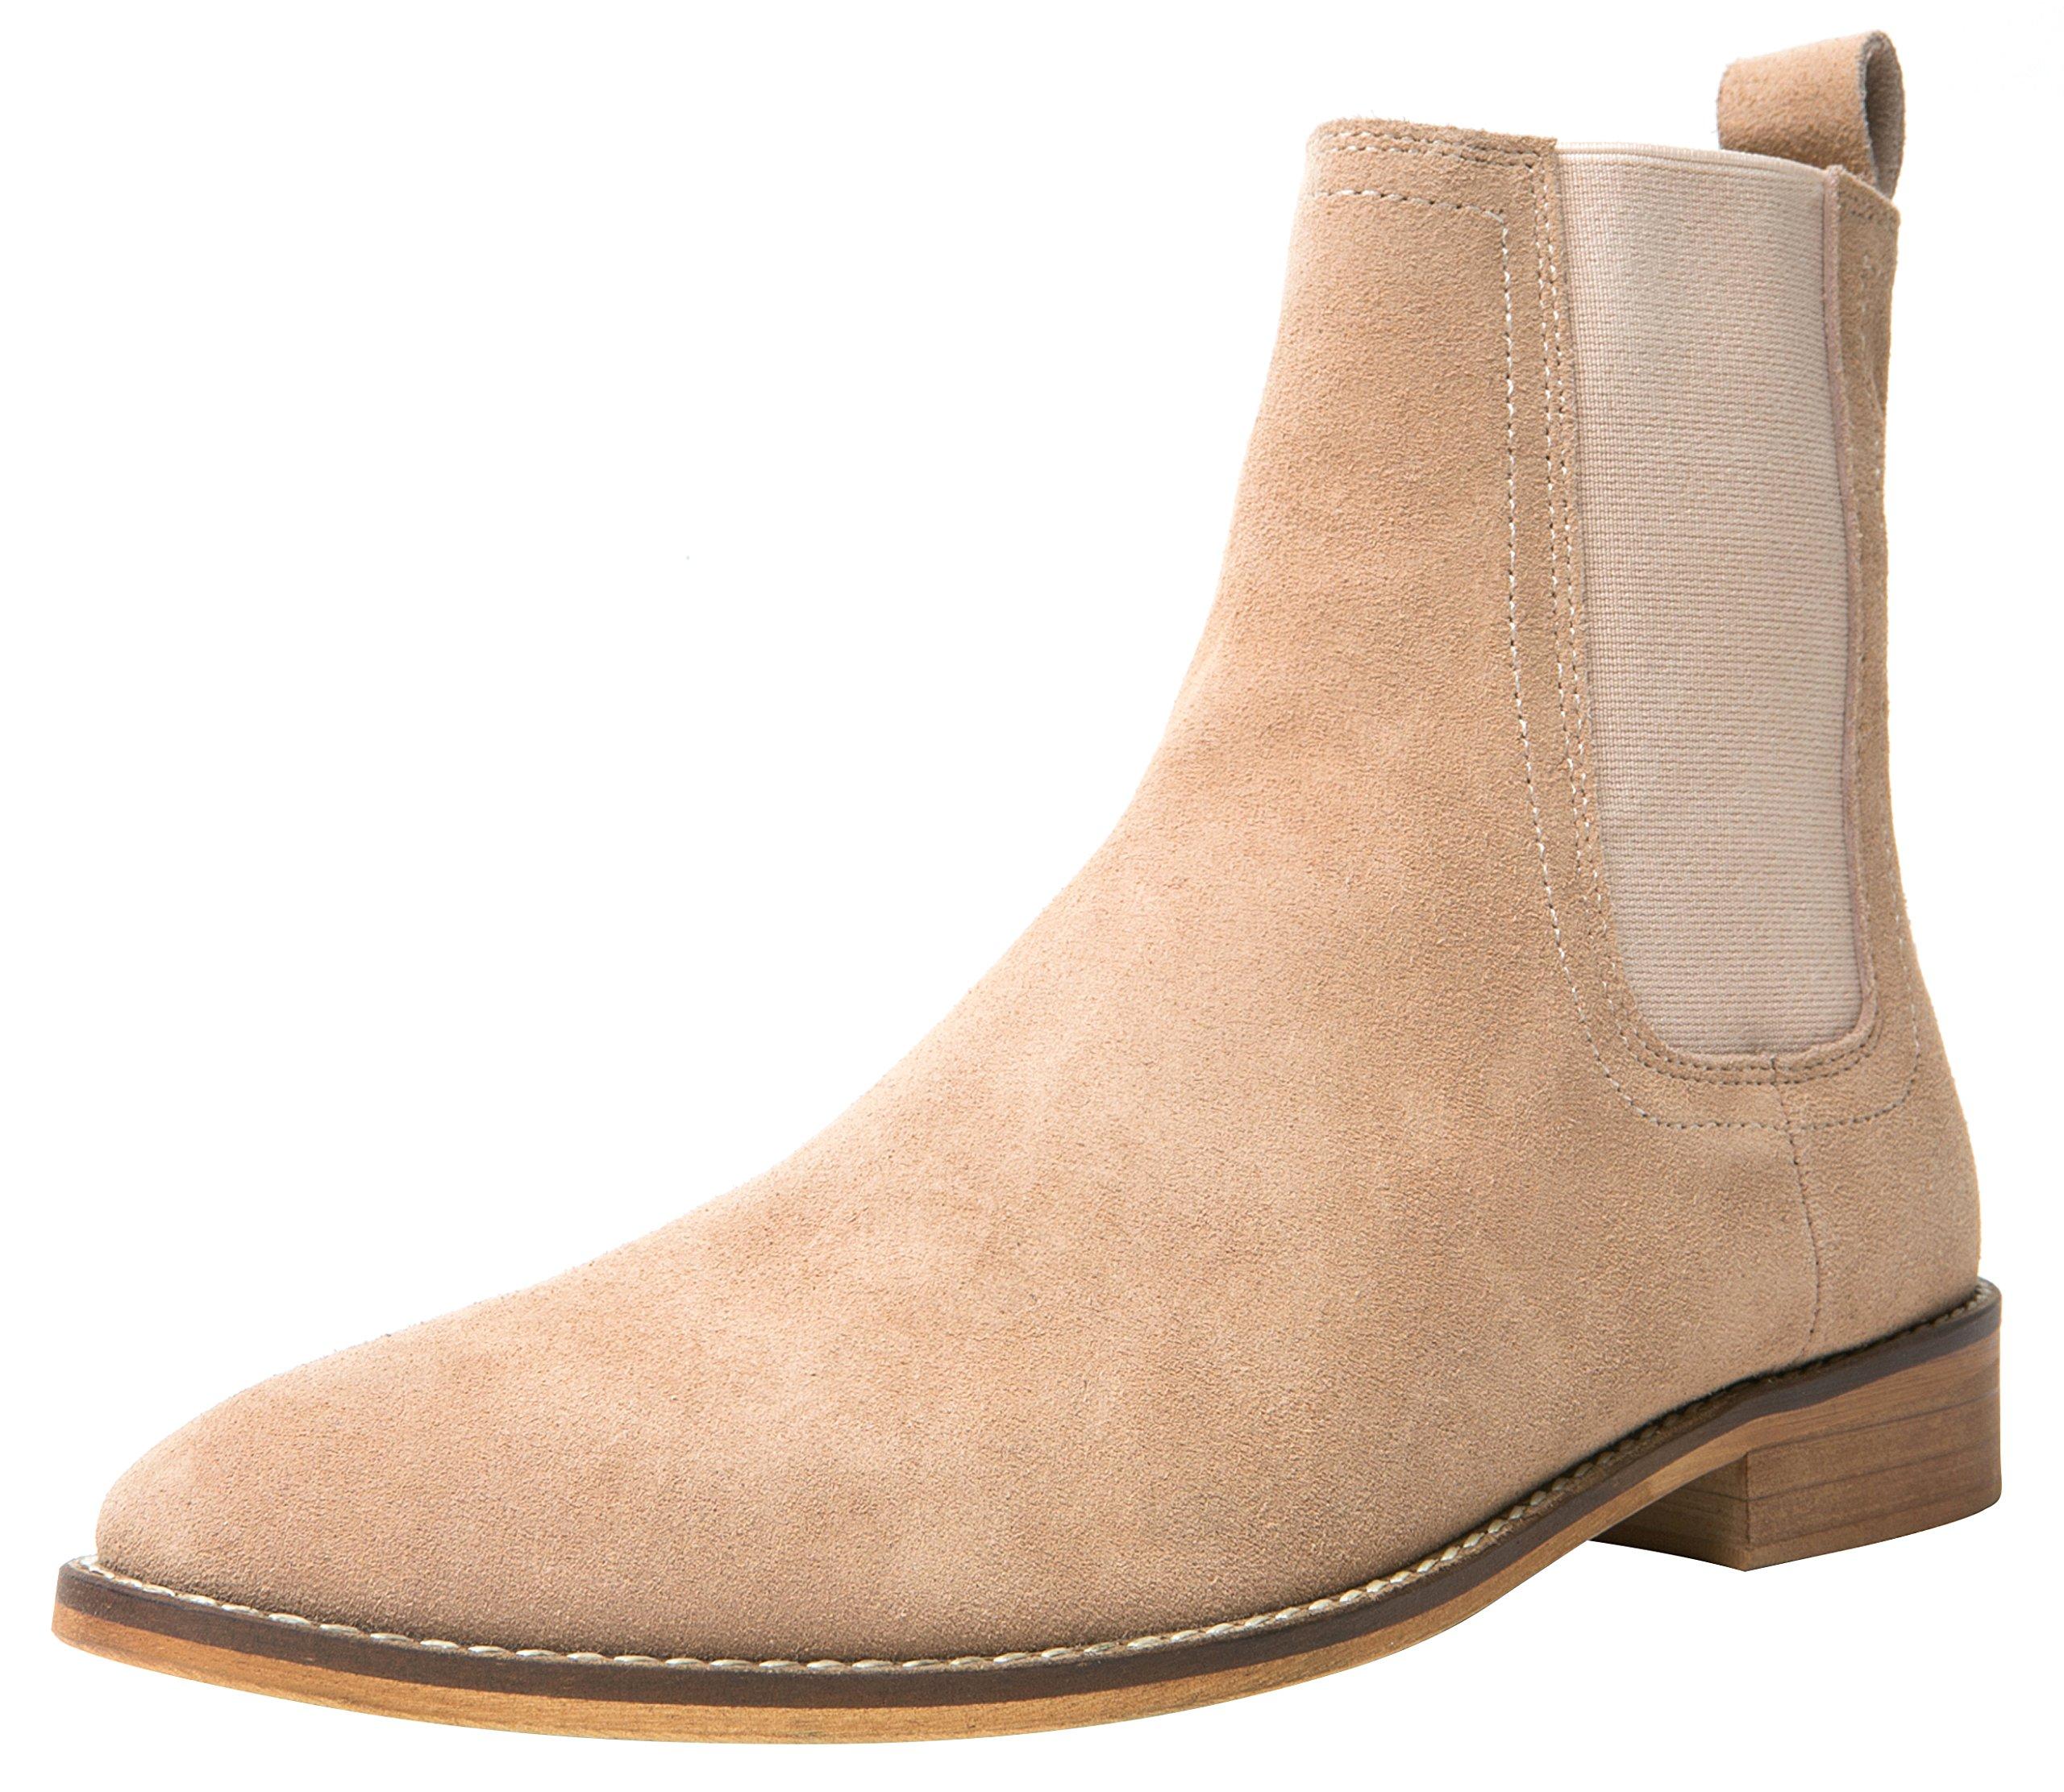 1778af1e5d Santimon Chelsea Boots Men Suede Casual Dress Boots Ankle Boots Formal  Shoes Black Brown Grey product